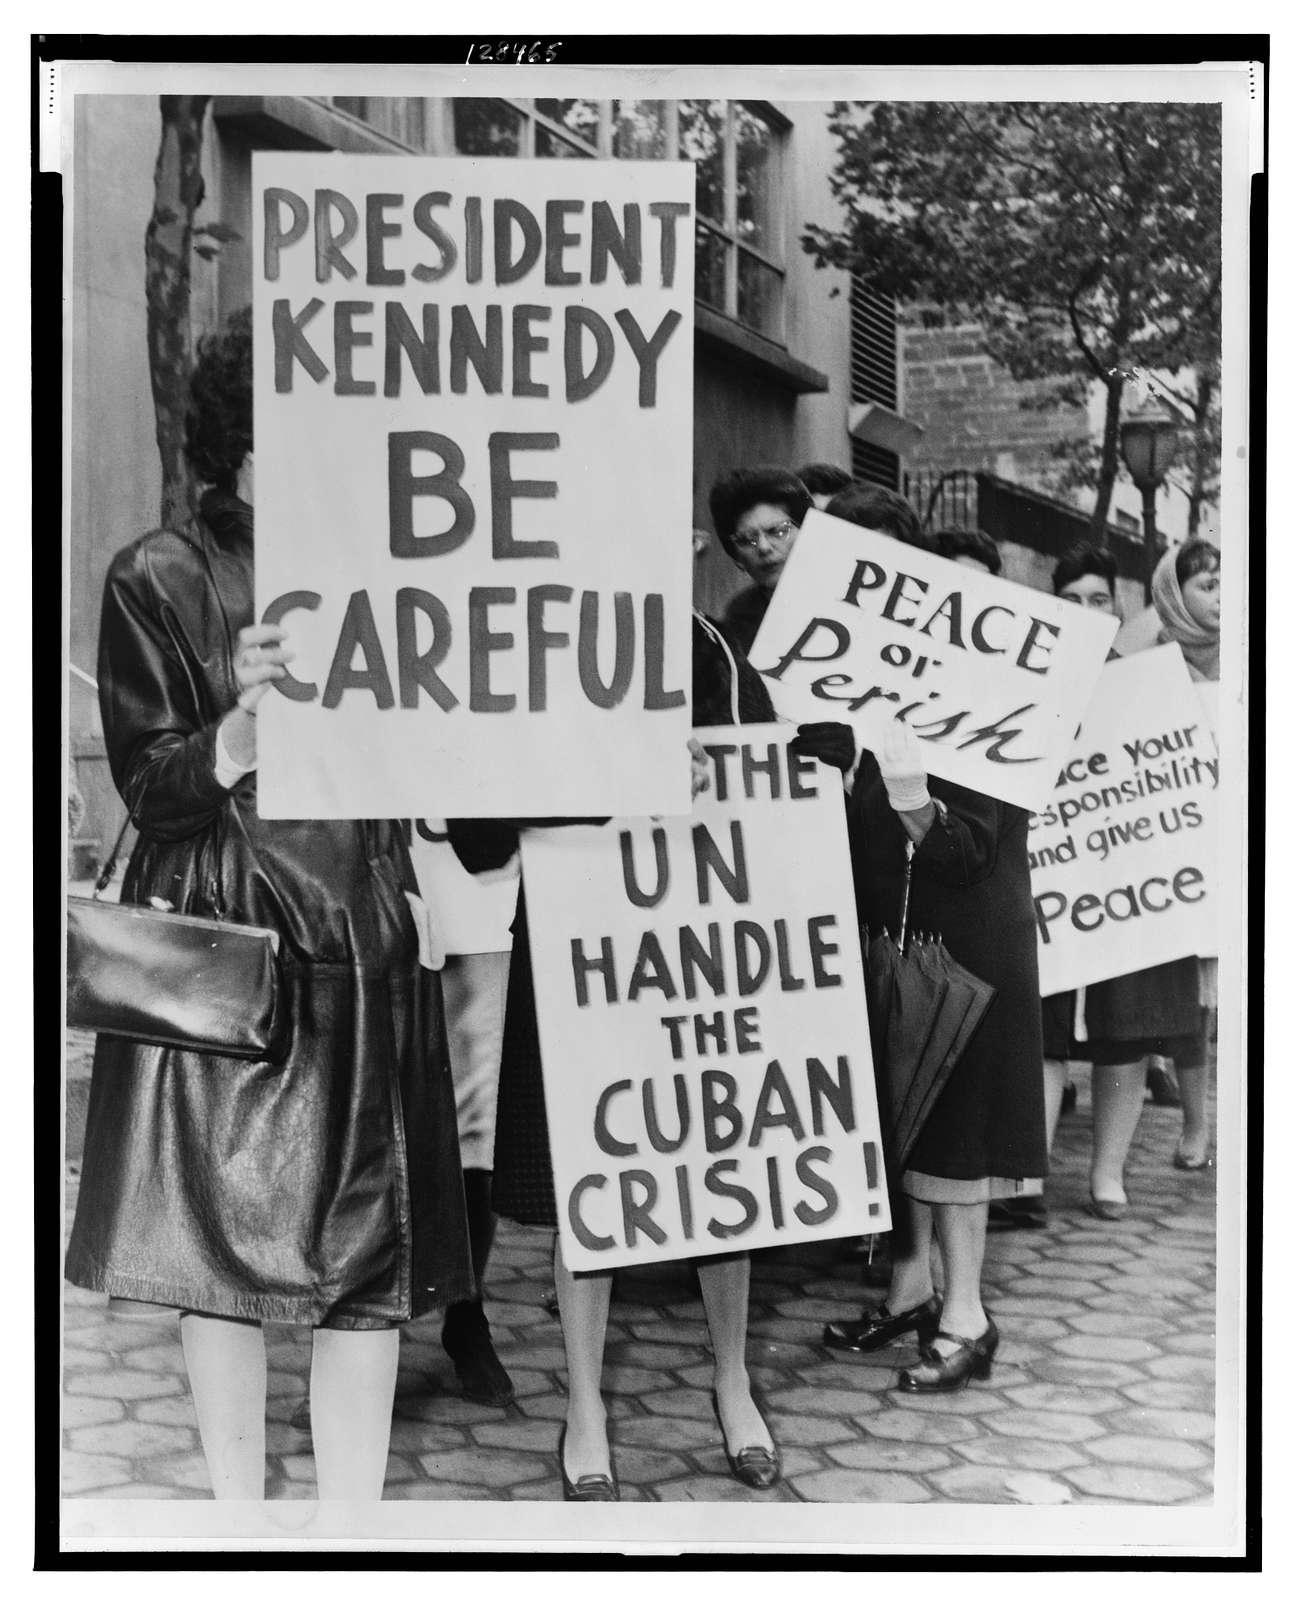 800 women strikers for peace on 47 St near the UN Bldg / World Telegram & Sun photo by Phil Stanziola.